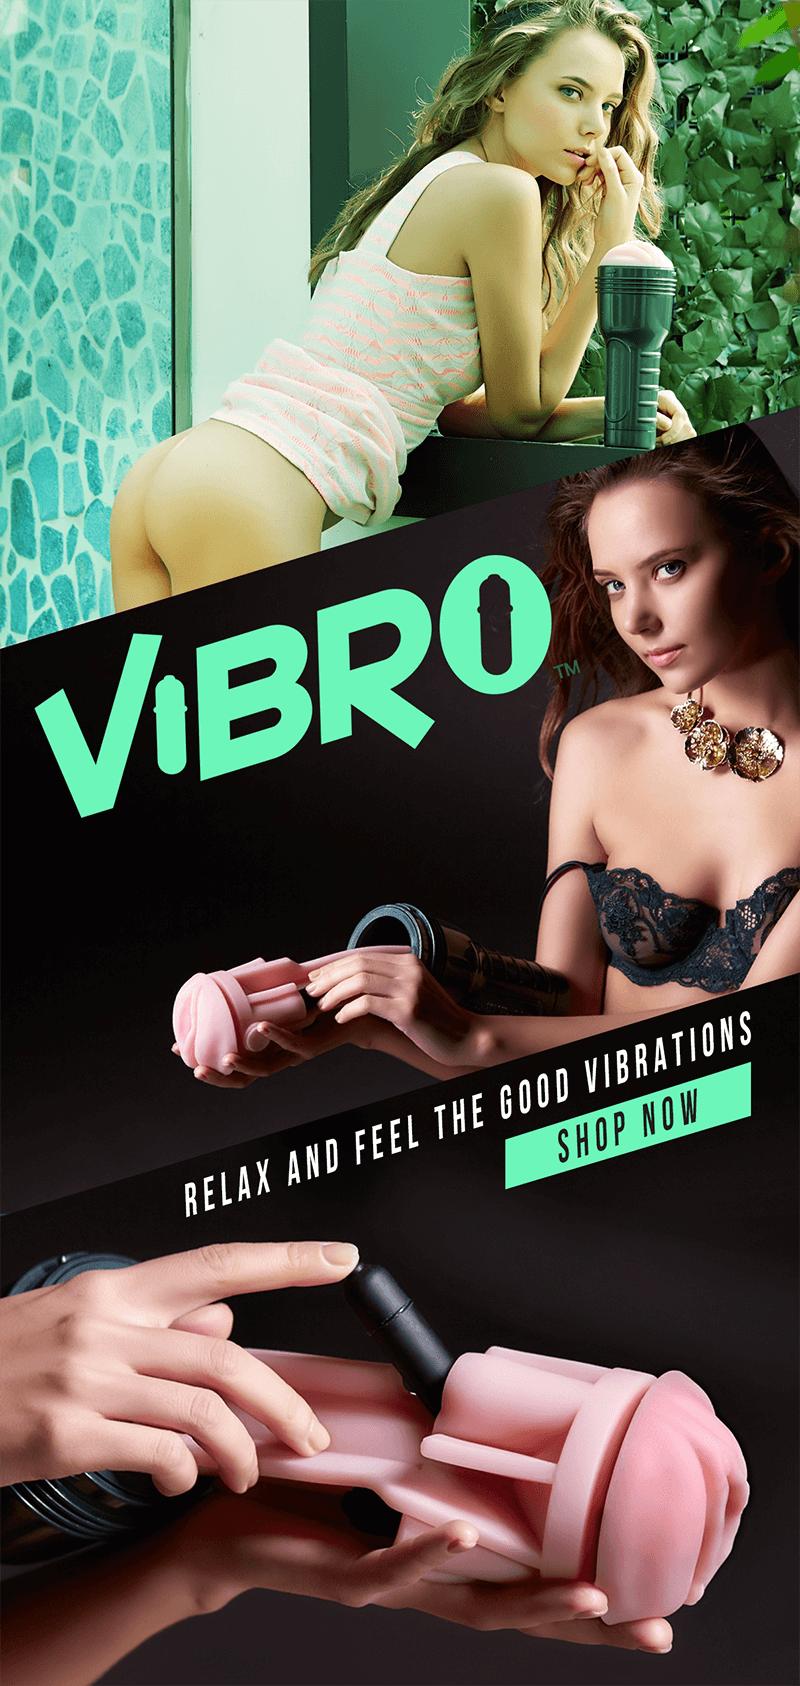 Fleshlight Vibro - Good Vibrations